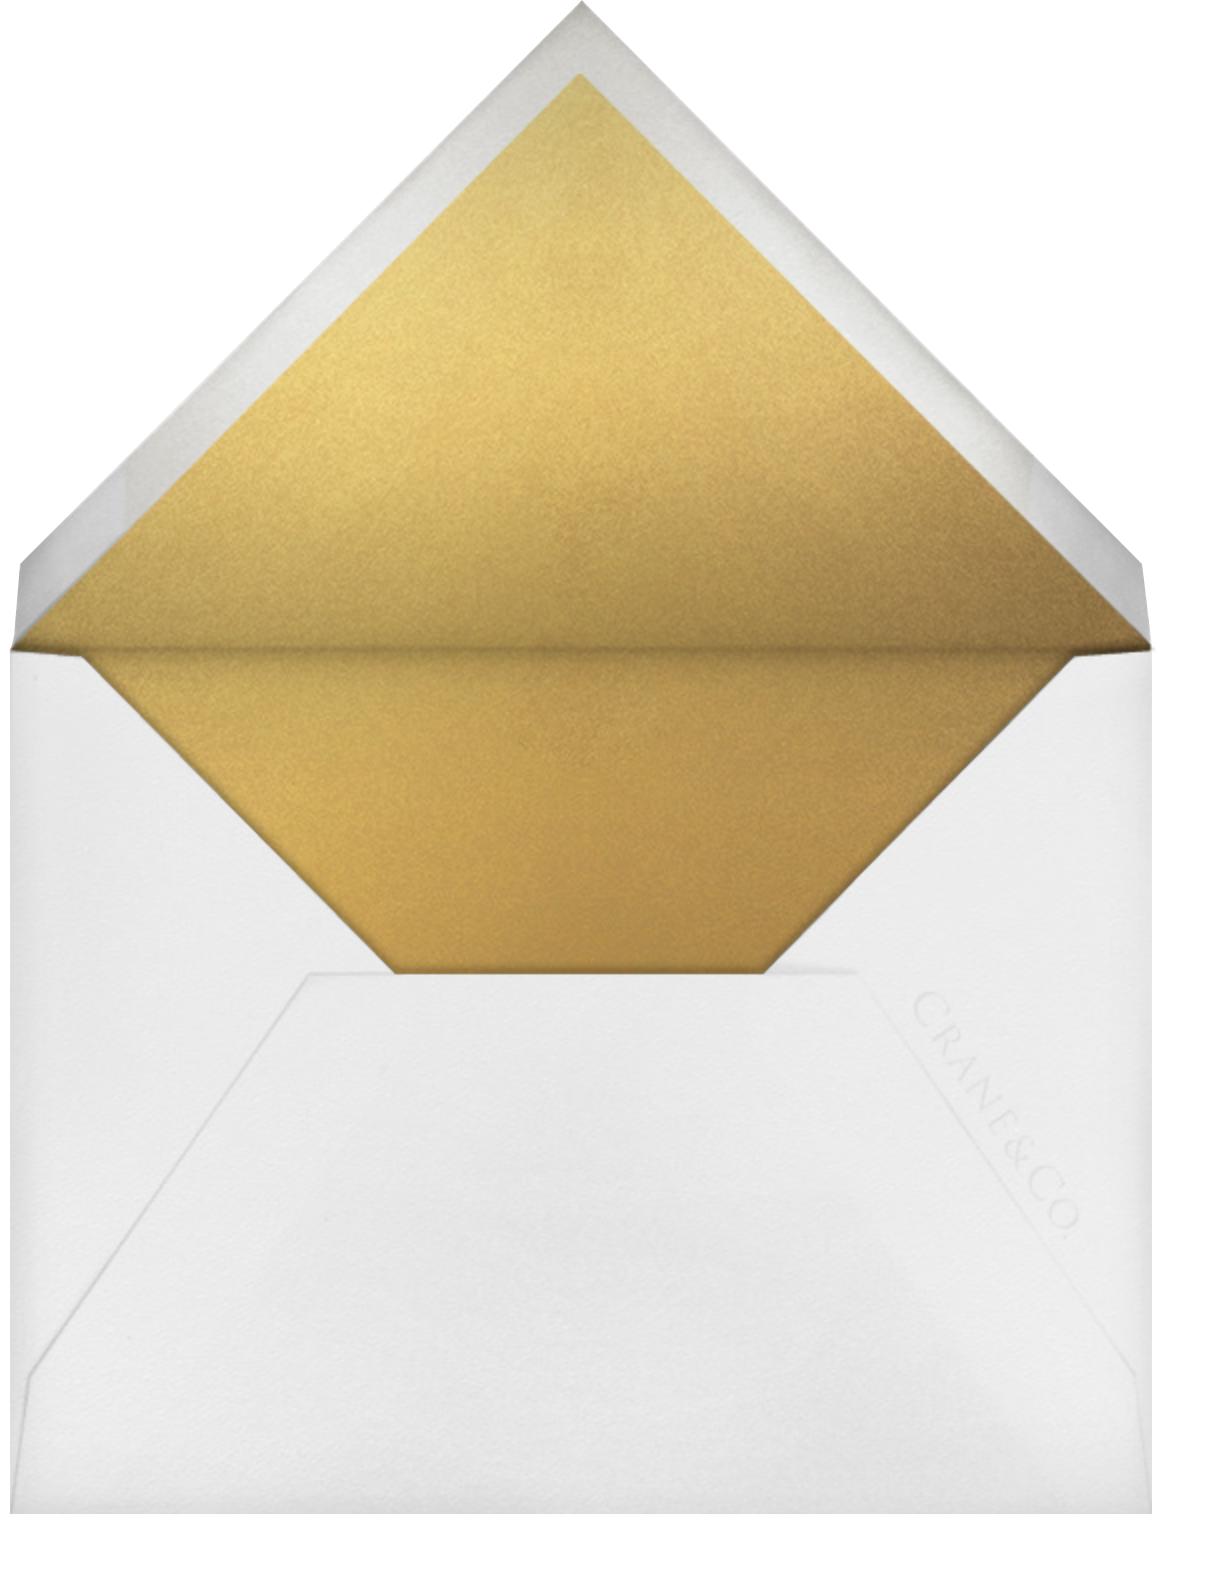 Place Vendome - Black - Paperless Post - Envelope